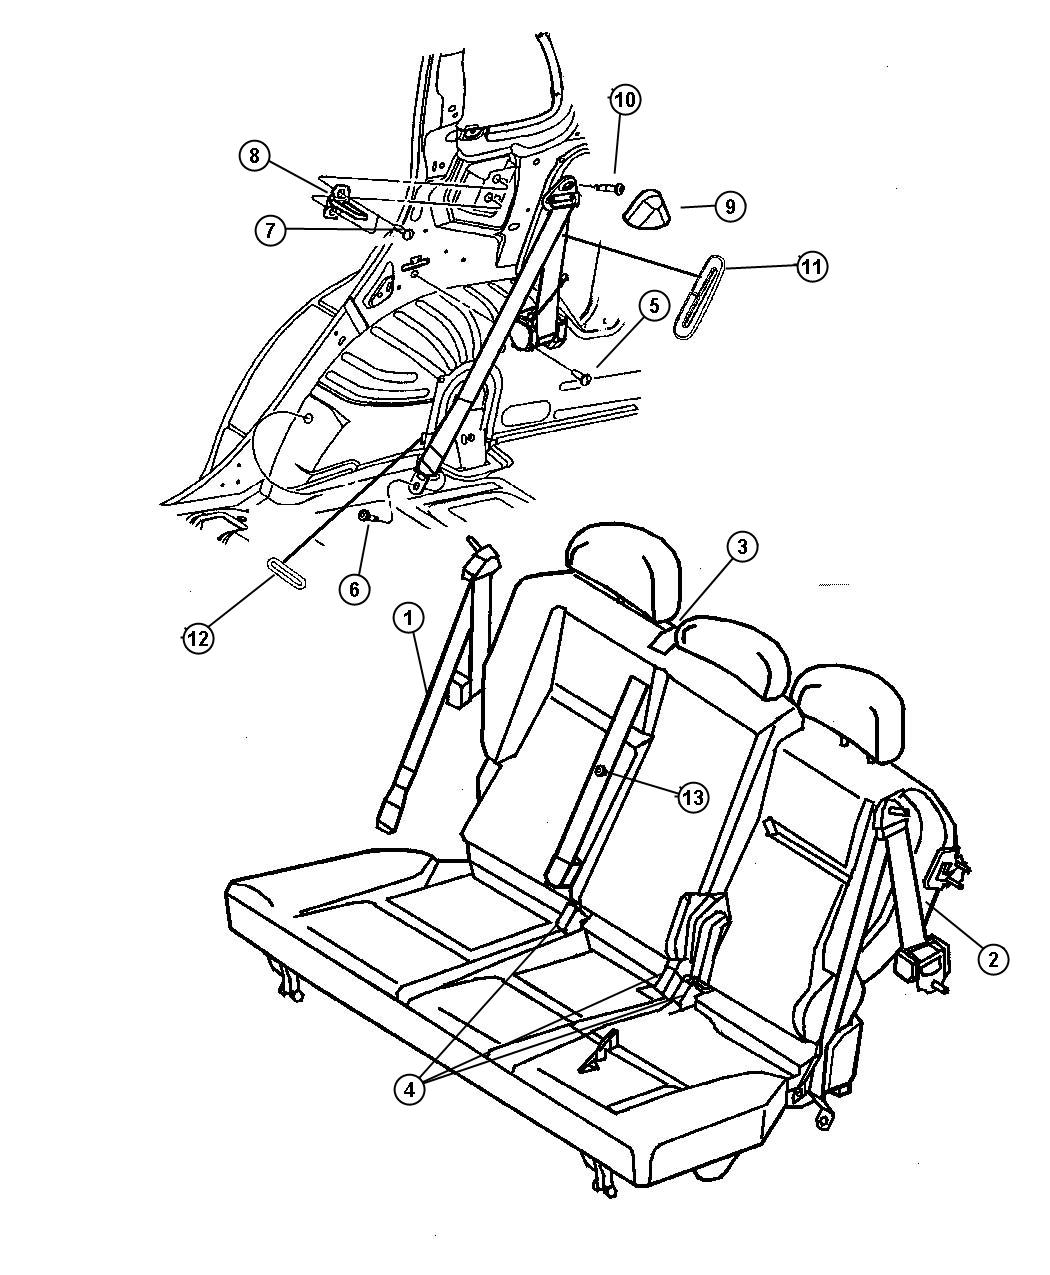 2012 Dodge Journey Seat belt. Outboard. Buckle half w